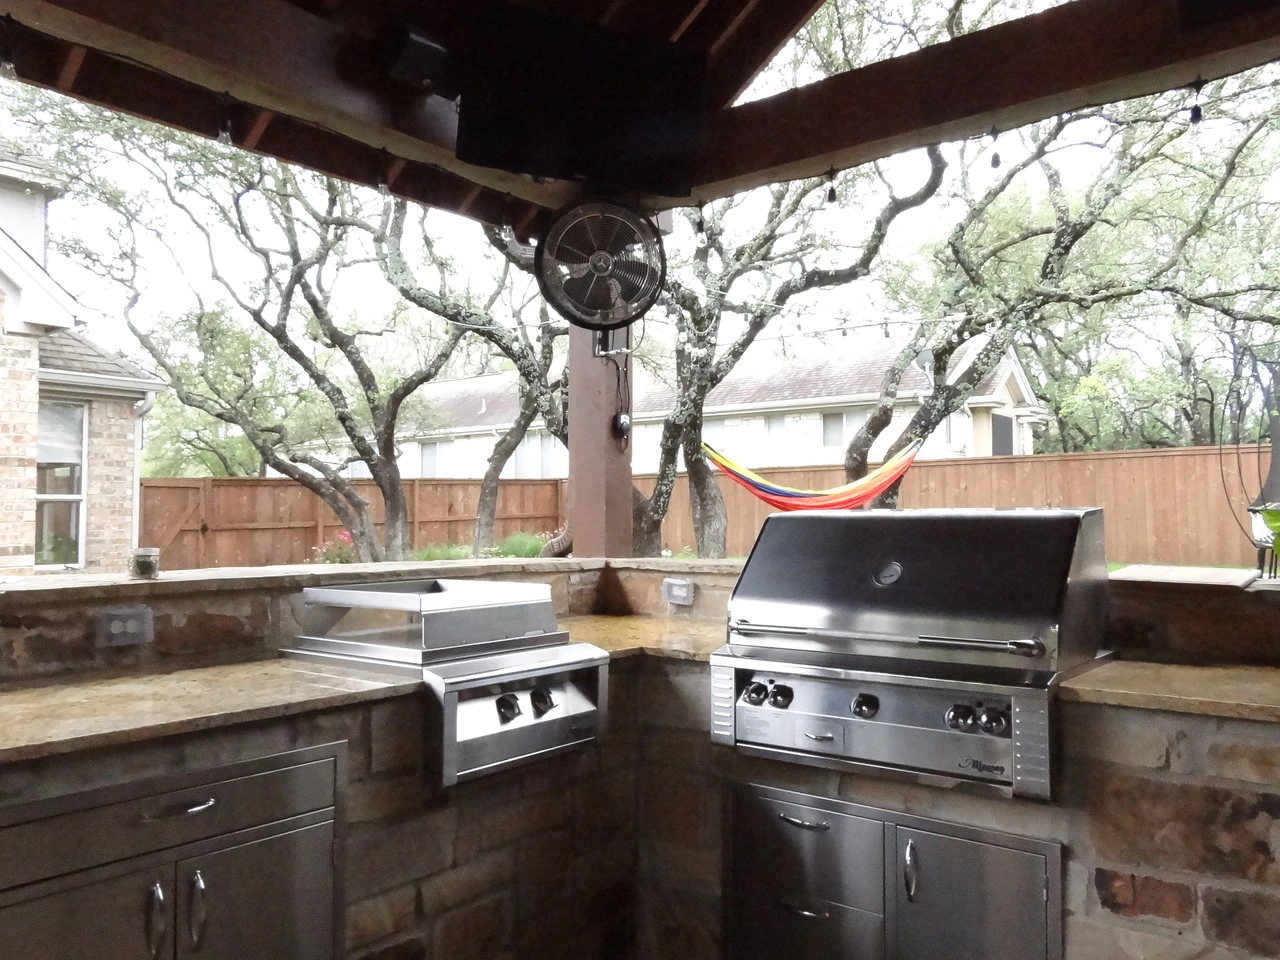 Outdoor Oscillating 18 Inch Fan w/ Mounting Bracket -3 Speed Control on Fan Motor installed on backyard kitchen of residential property